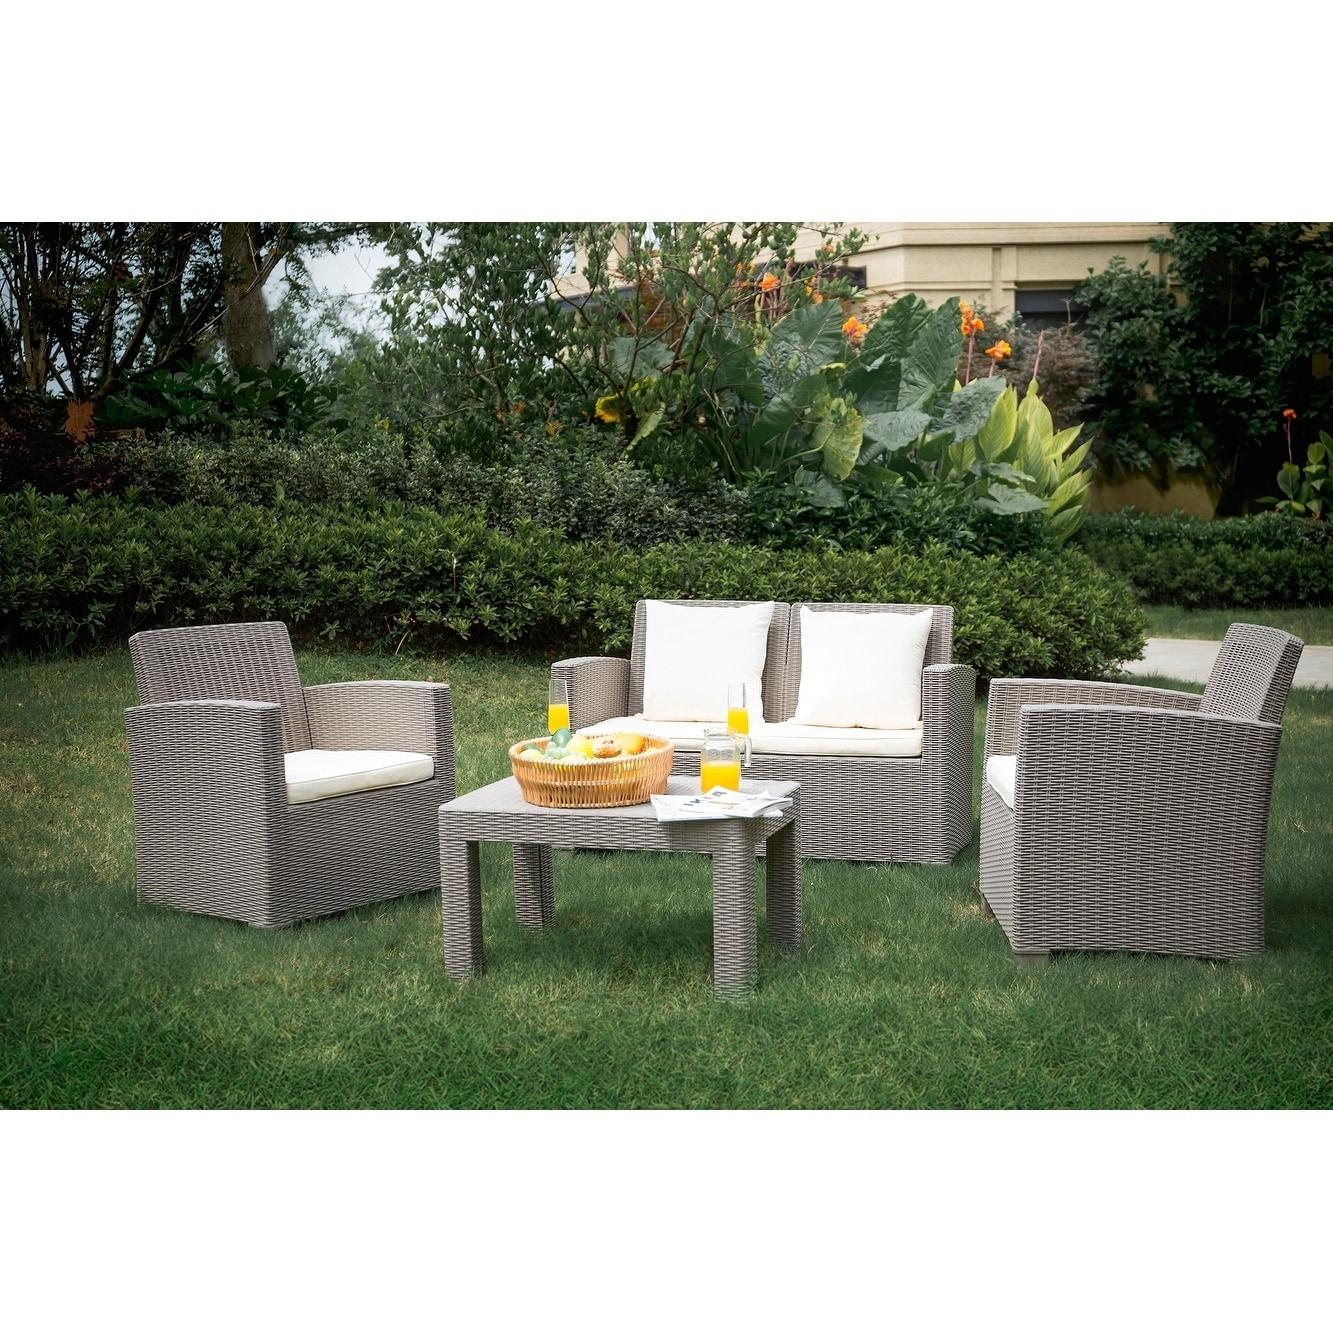 Outdoor 4 Piece Plastic Rattan Wicker Sofa Set By Moda Furnishings